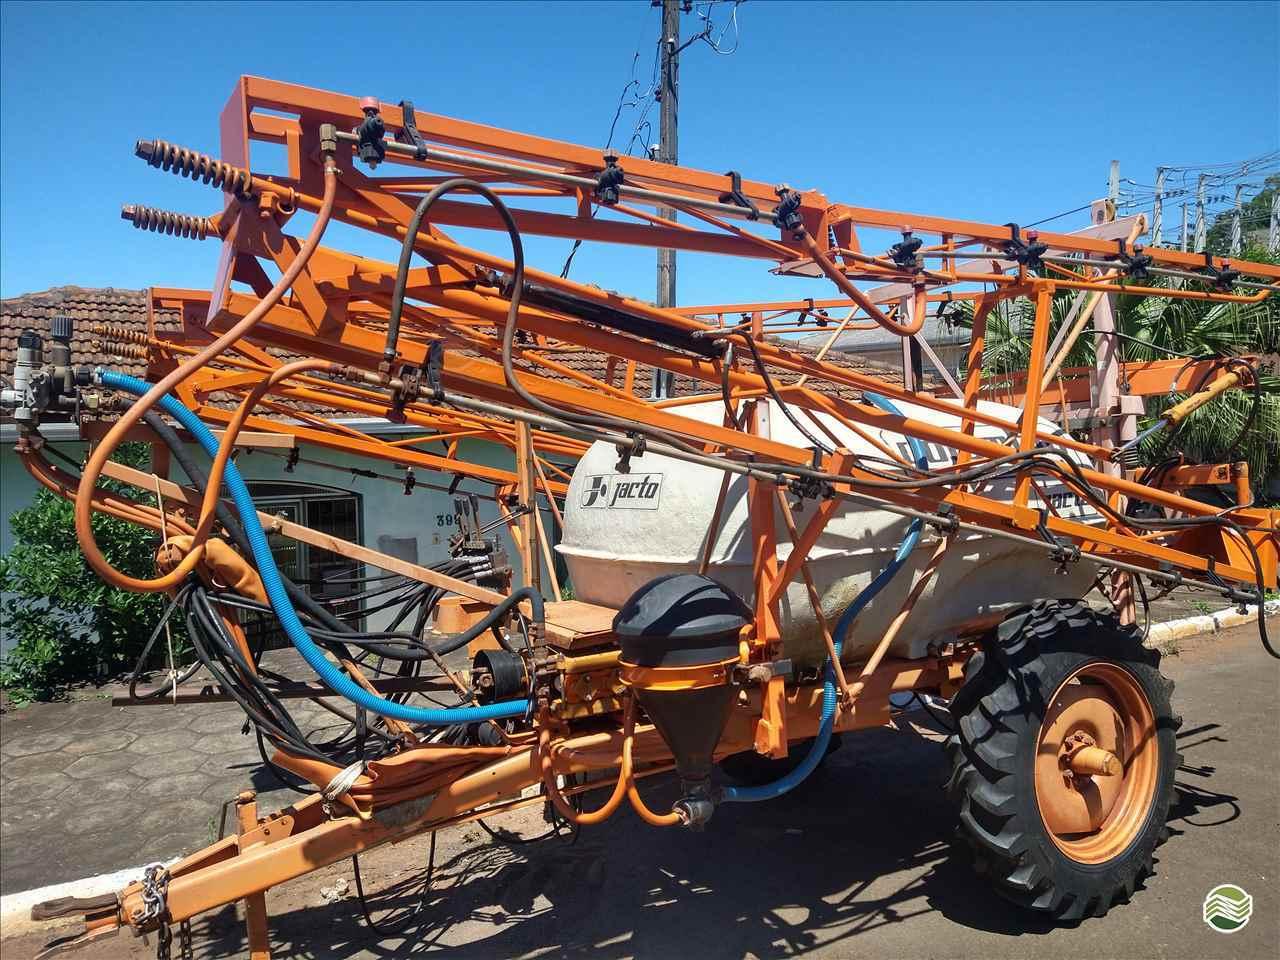 COLUMBIA AD18 de P. M. Muller Maquinas e Implementos Agrícolas - SALTO DO LONTRA/PR